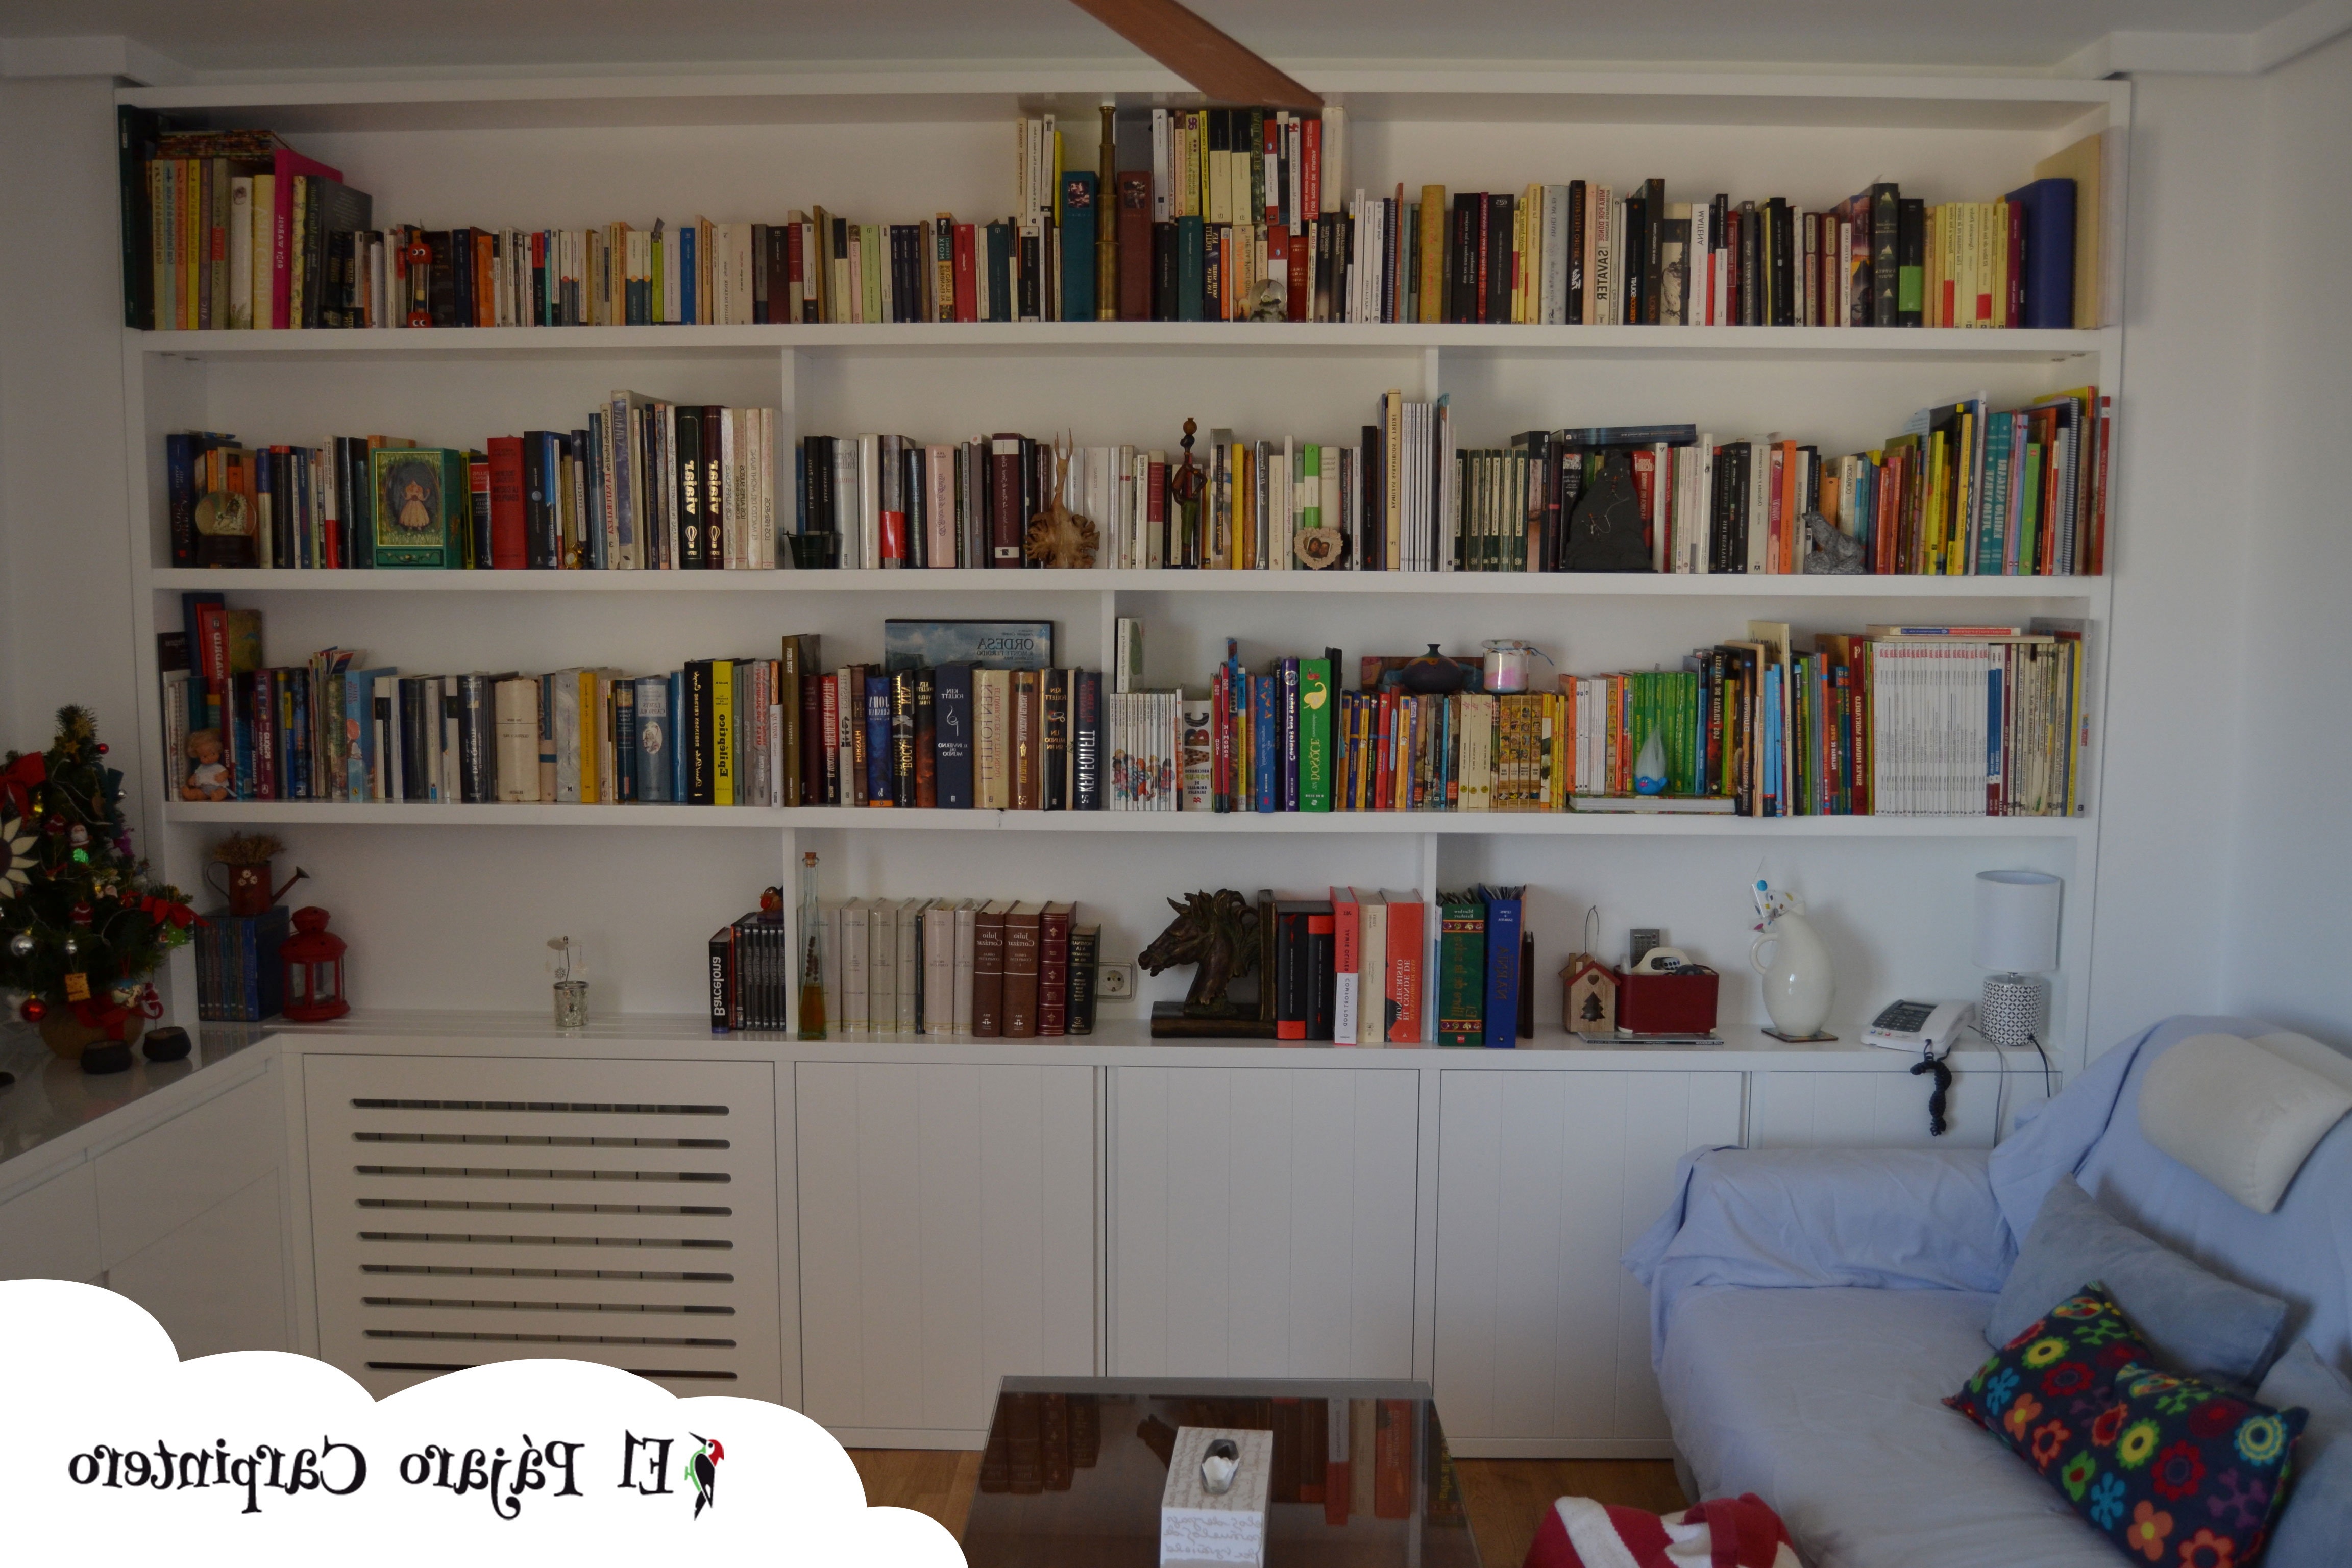 Mueble Libreria Salon Dwdk El Mueble Ideal Para Tu Salà N El Pà Jaro Carpintero